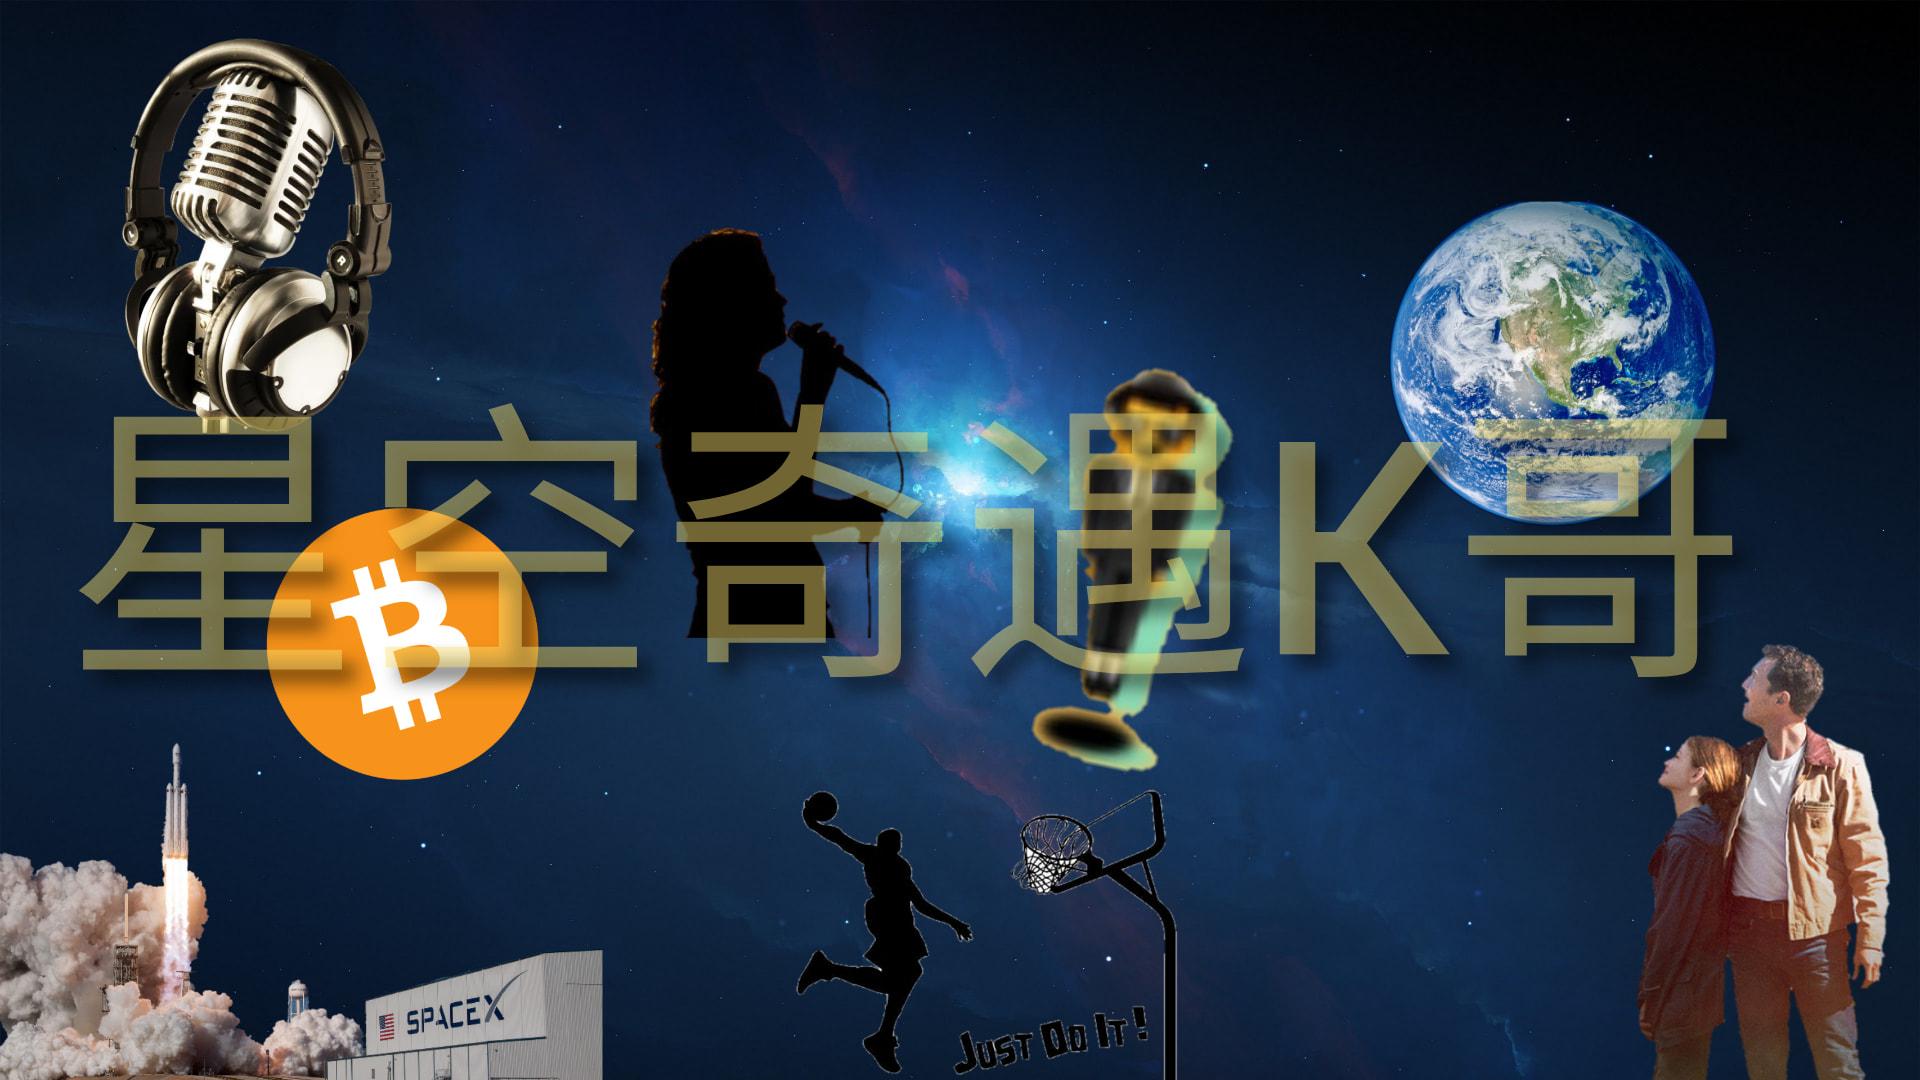 星空奇遇k哥 - Crypto K